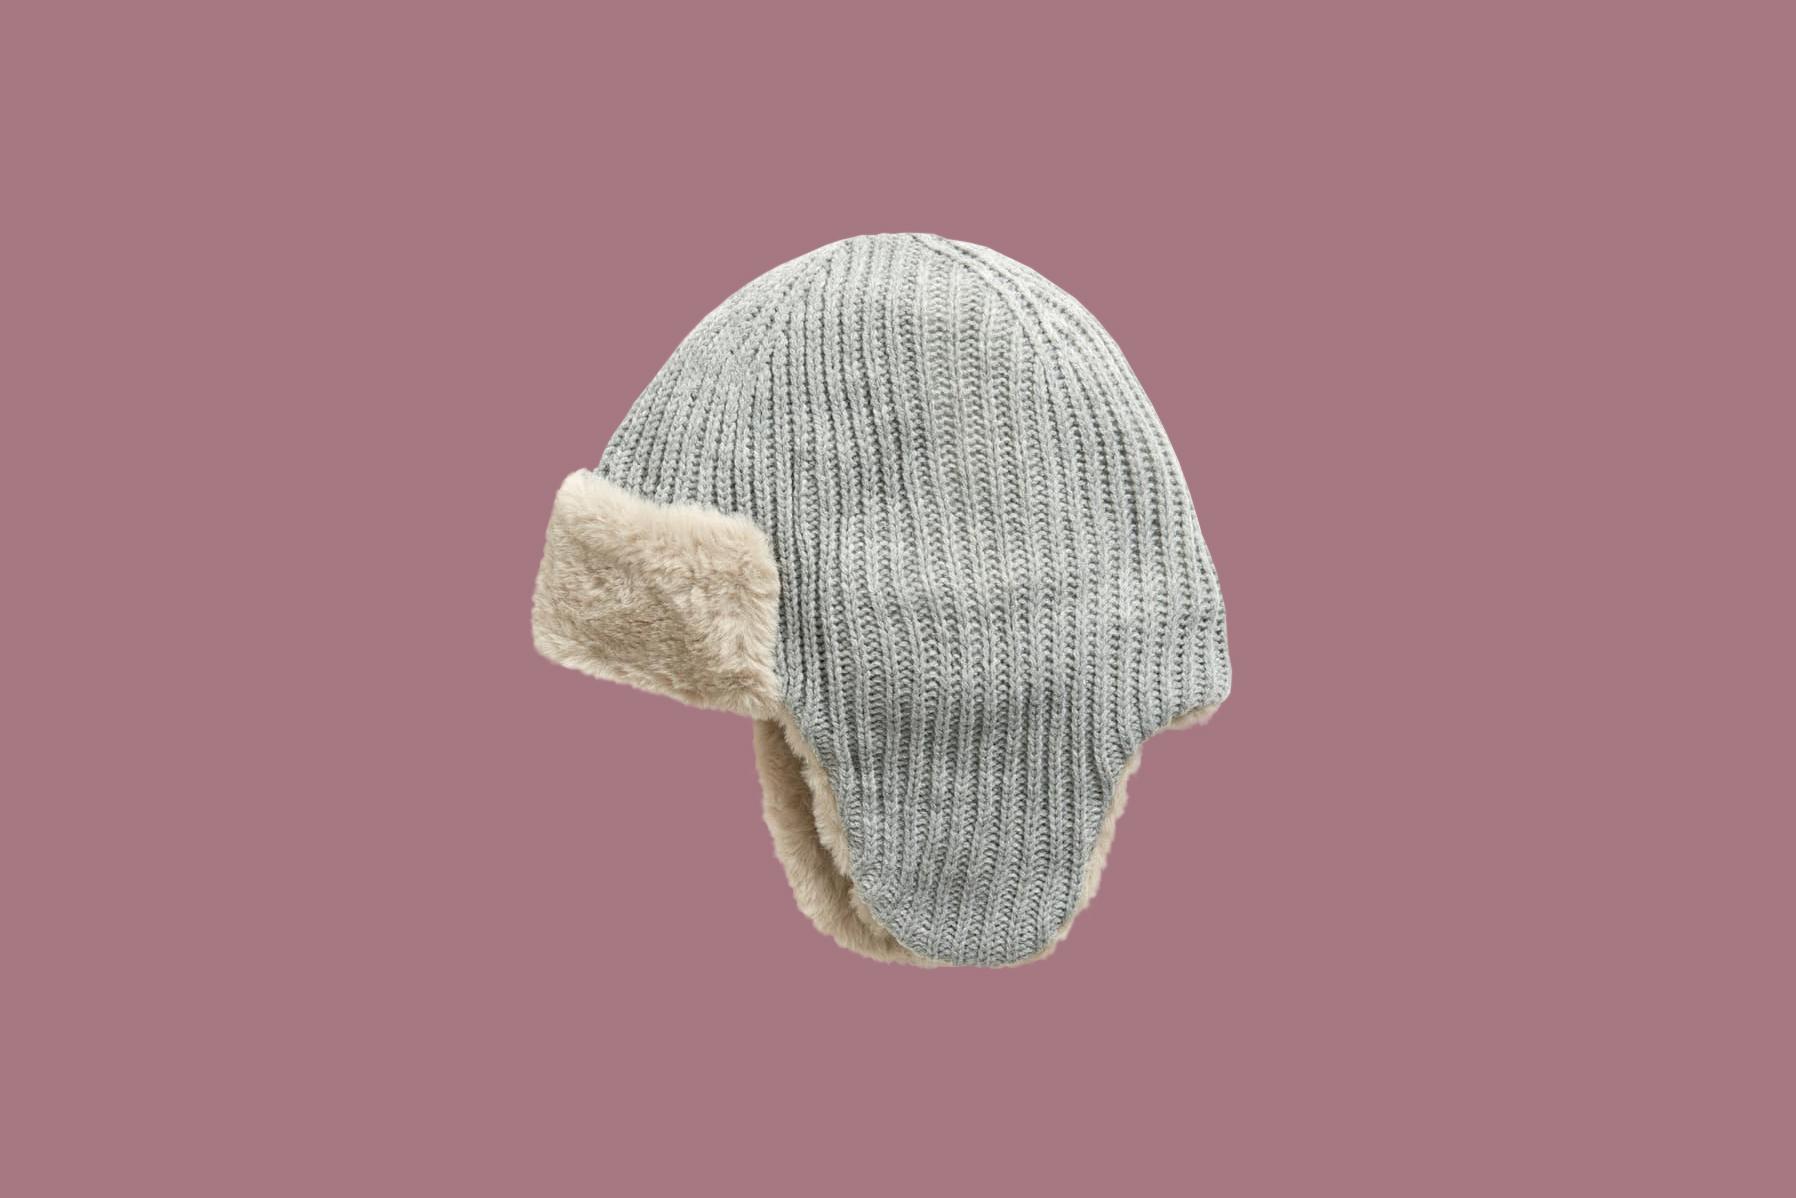 gray knit hat